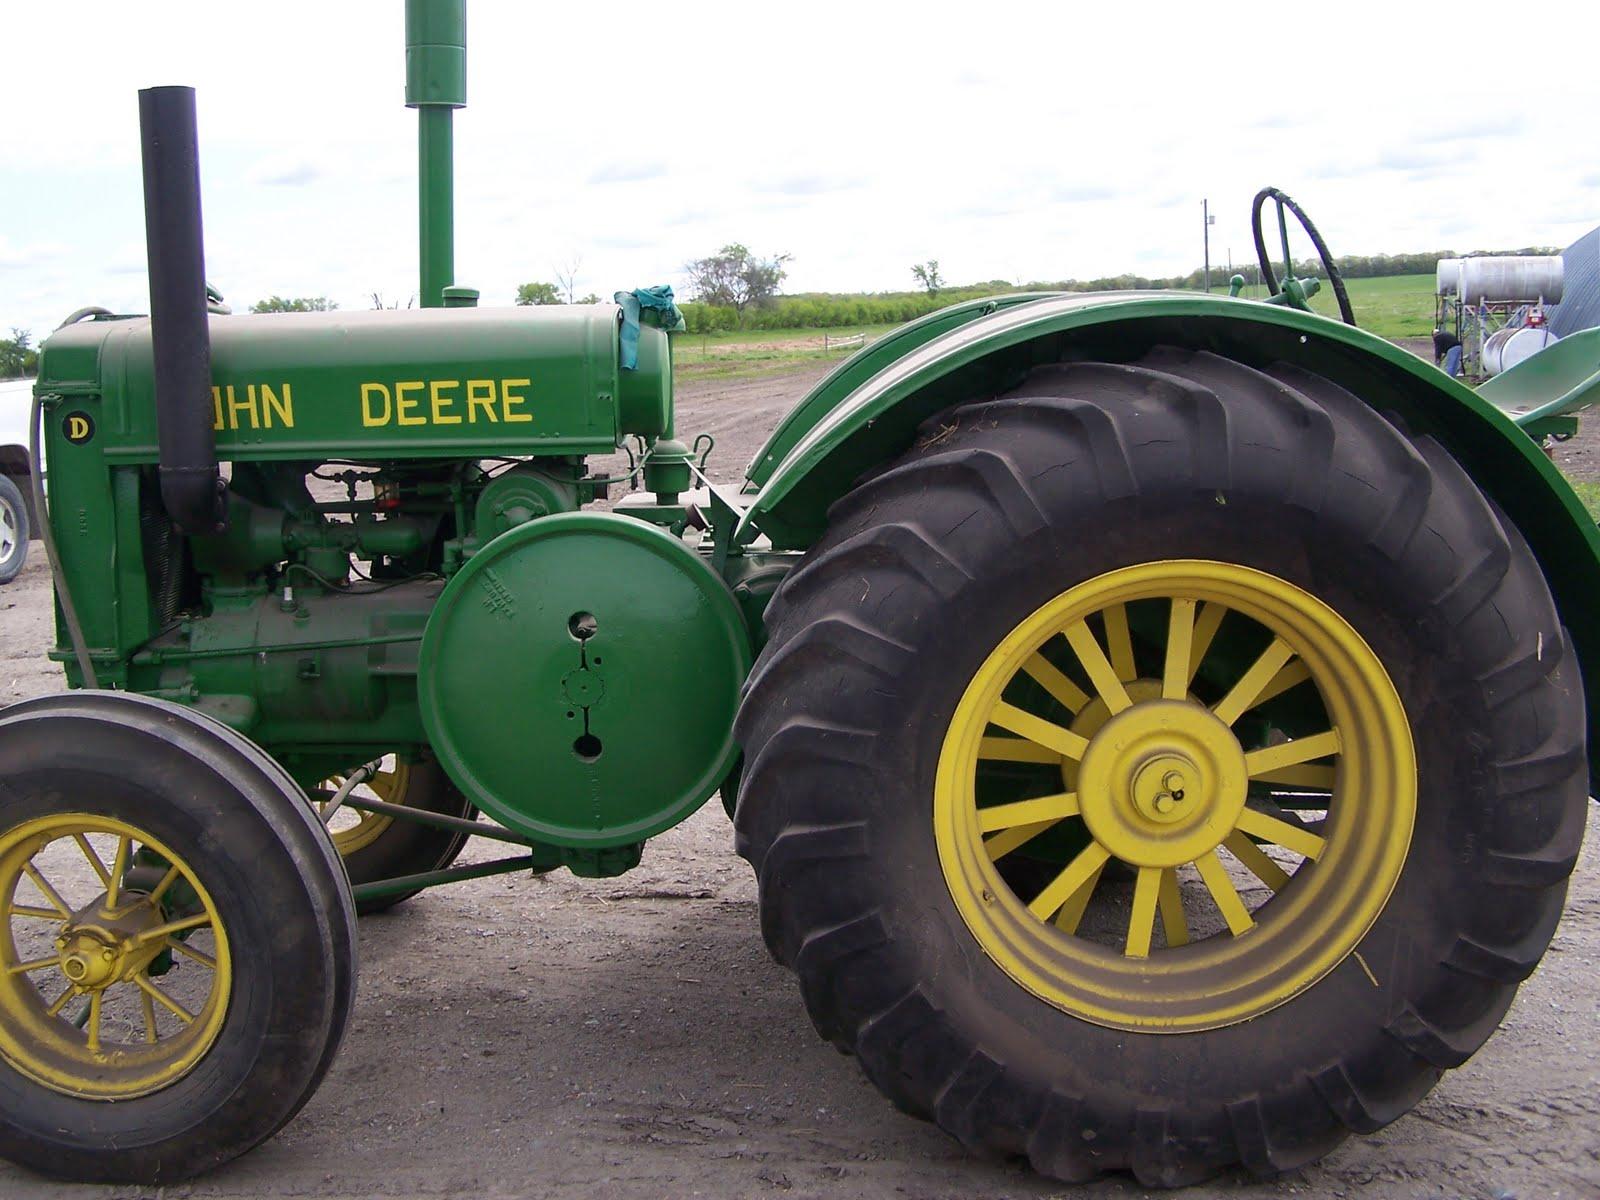 John Deere 4010 Wheatland : Different coloured junk john deere quot d